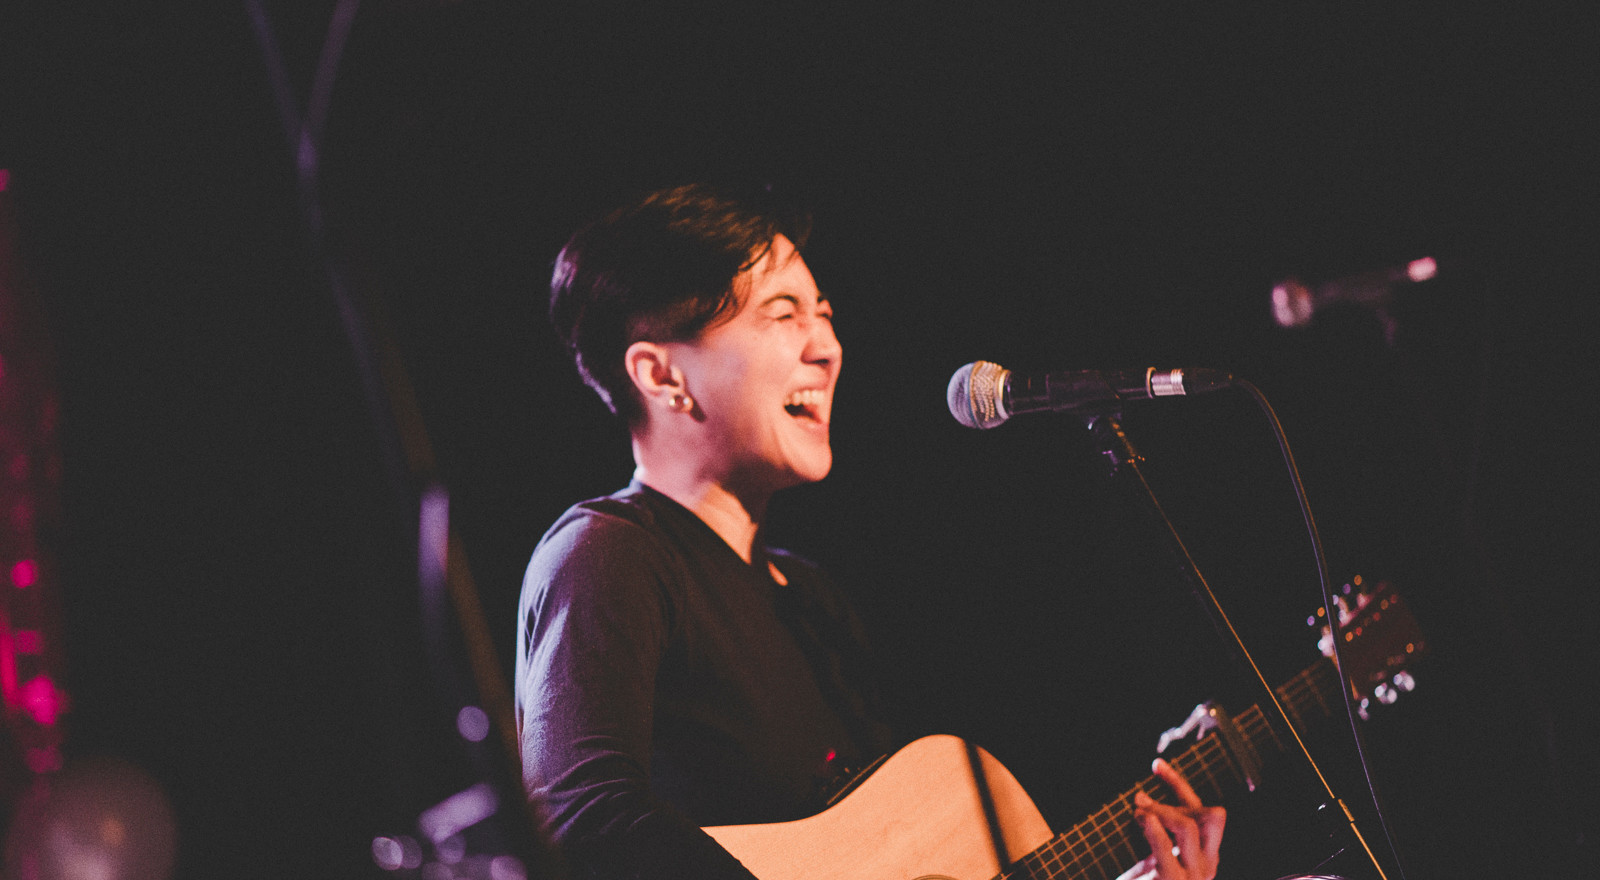 Jenn Nucum live performance.